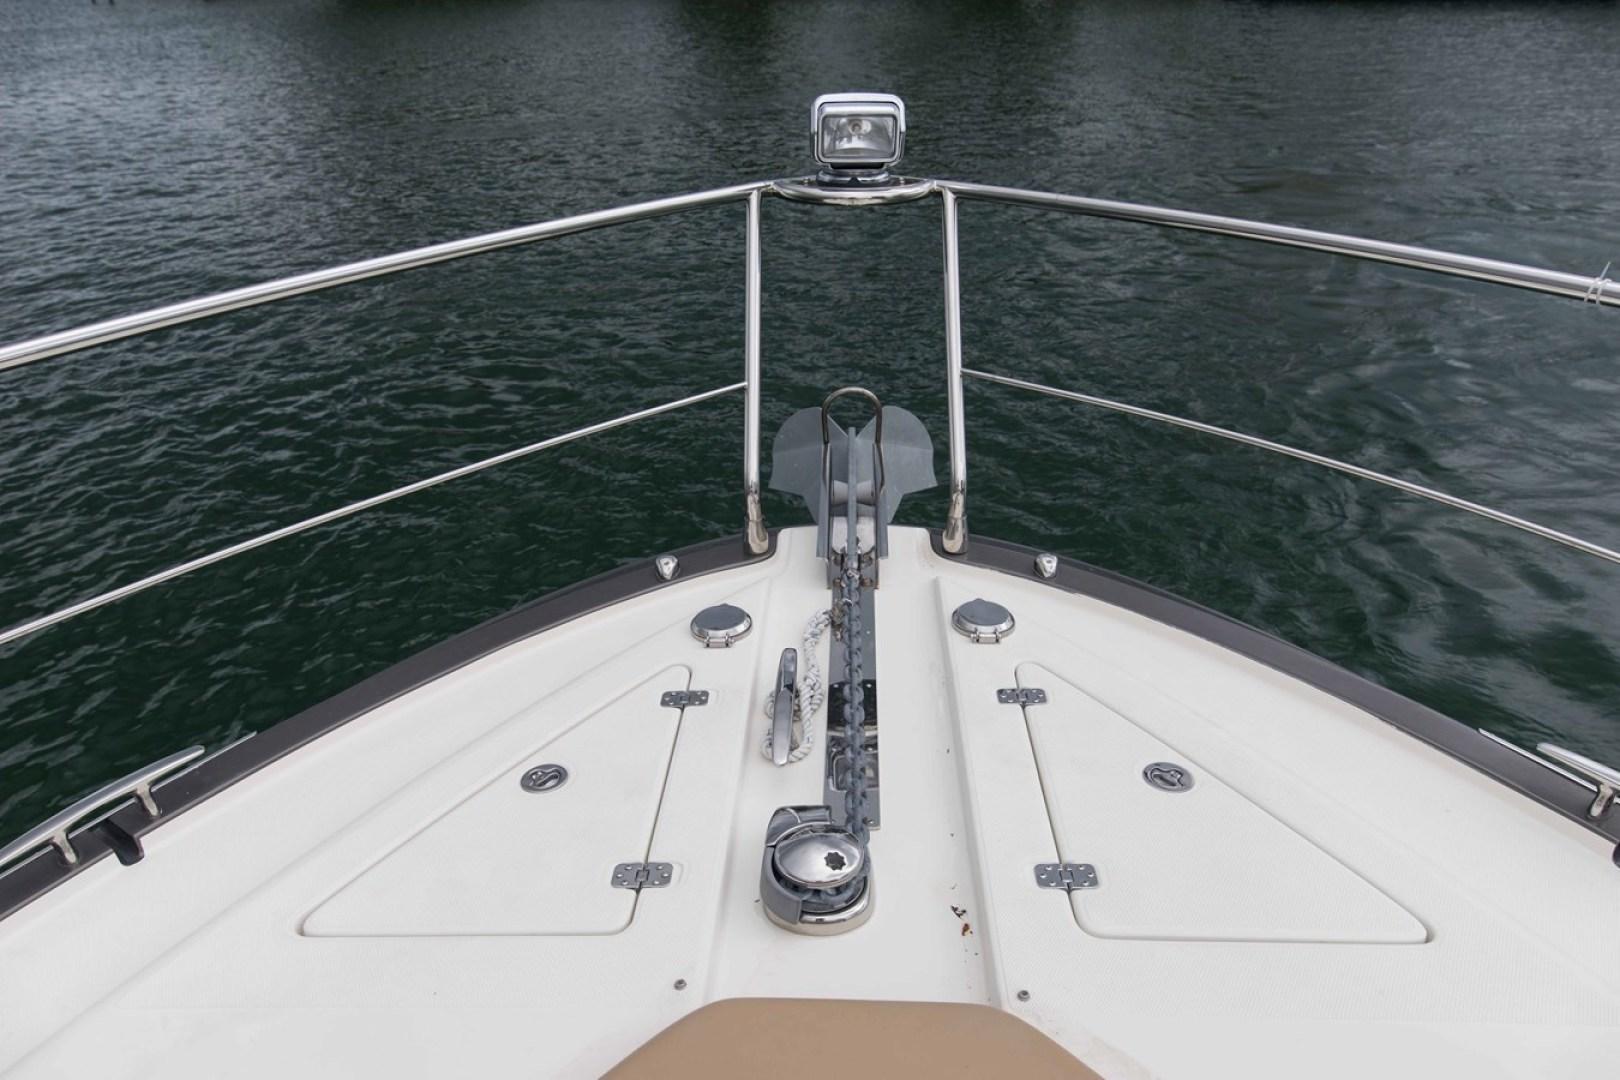 Anchor and Windlass